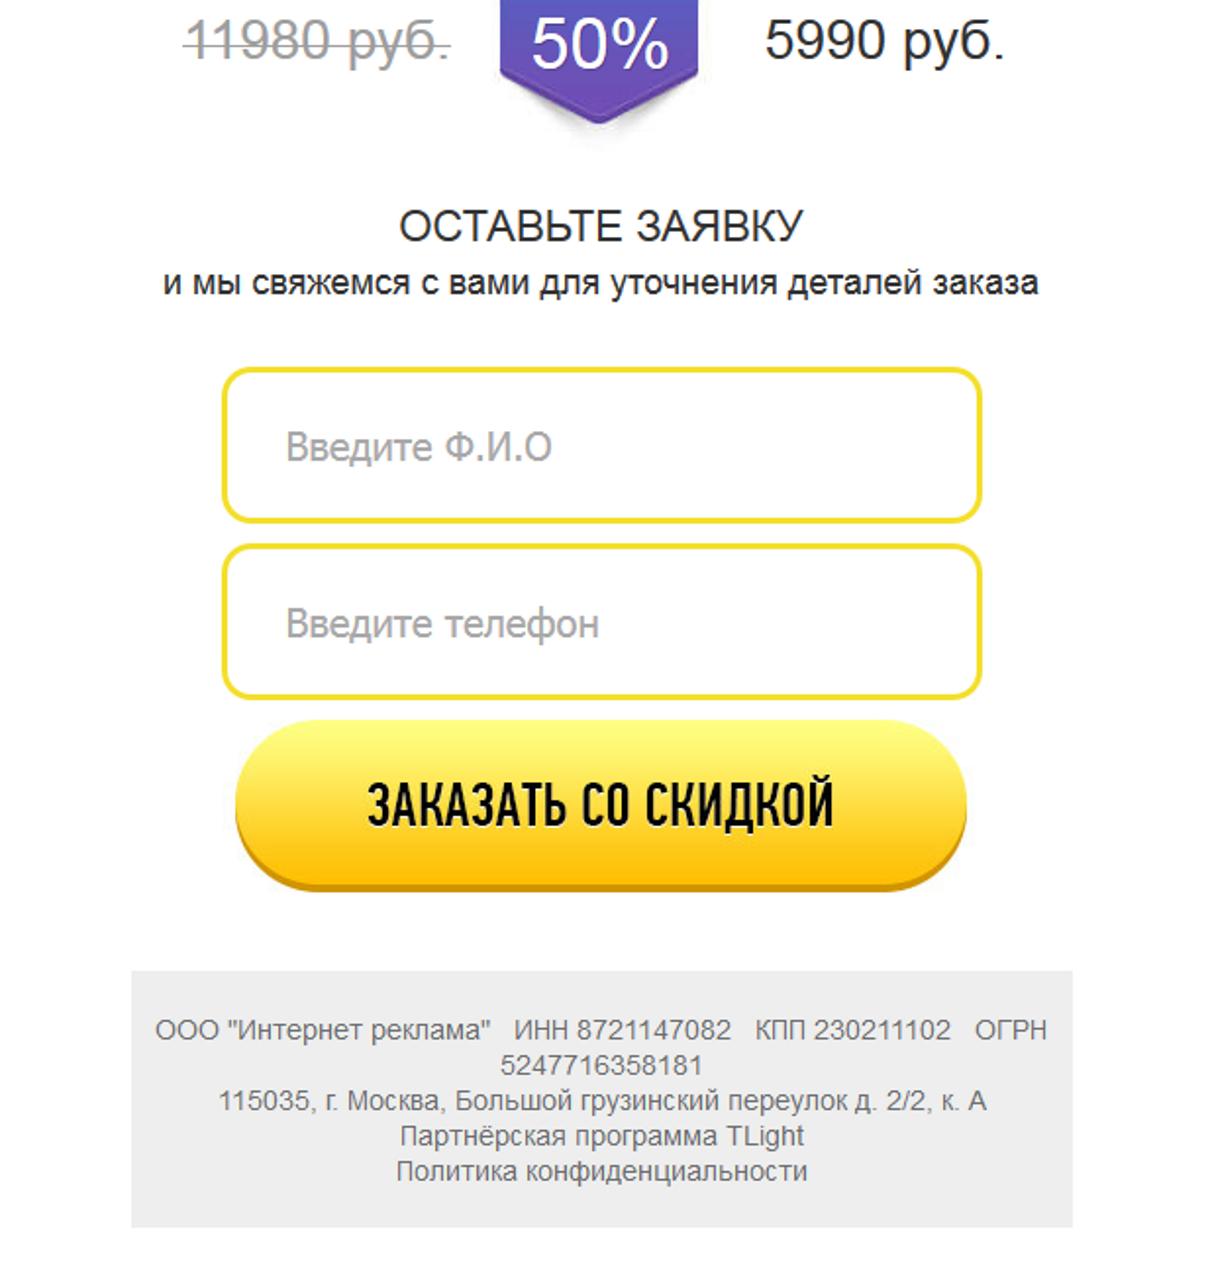 "Жалоба-отзыв: ООО ""Интернет реклама"" - Привезли не тот товар.  Фото №3"